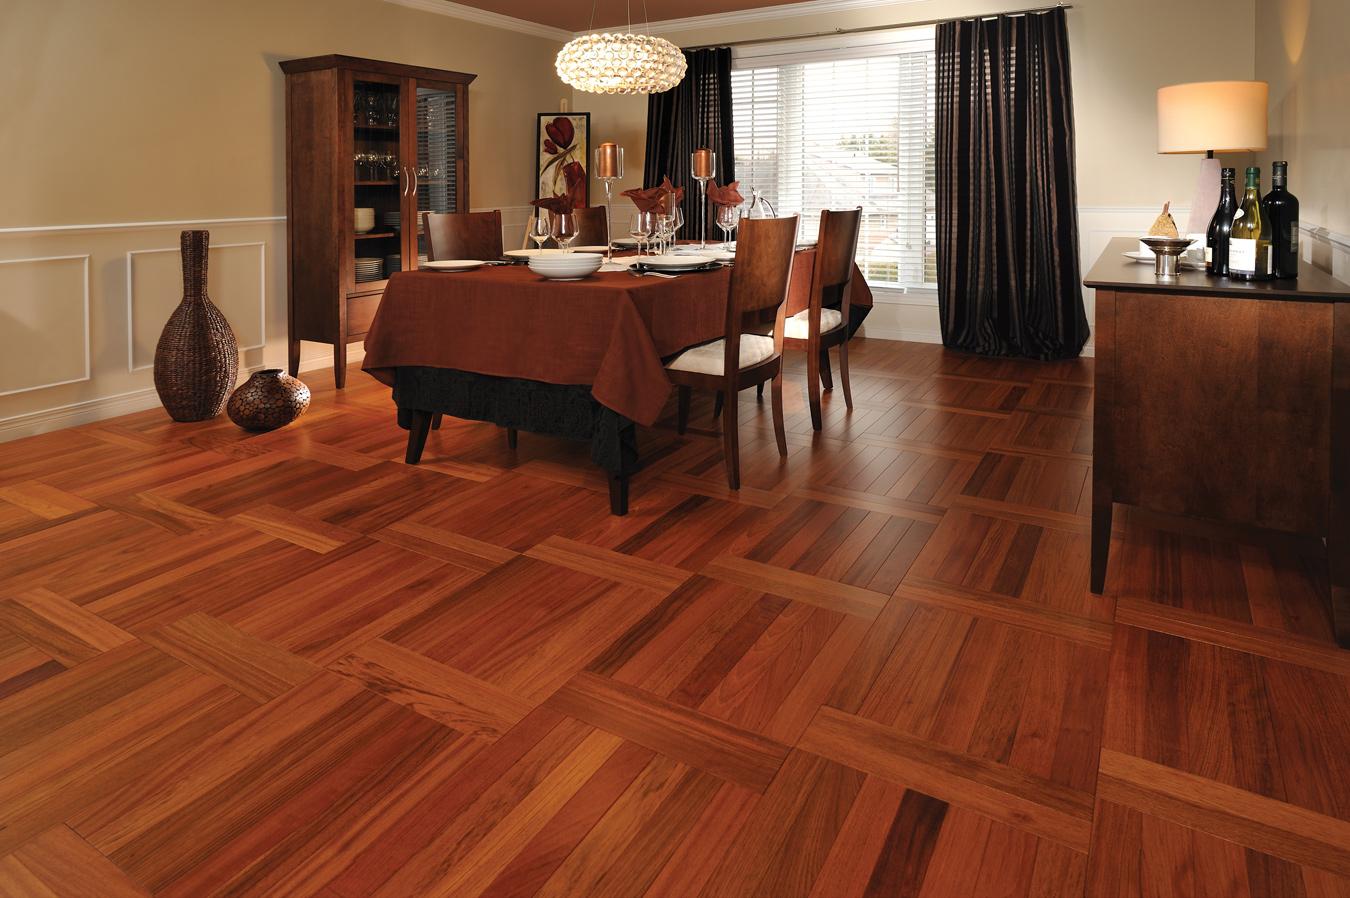 laminate wood flooring ideas faux wood flooring bayur borneo floor tile in 2017 including hardwood  designs UYBDOMA